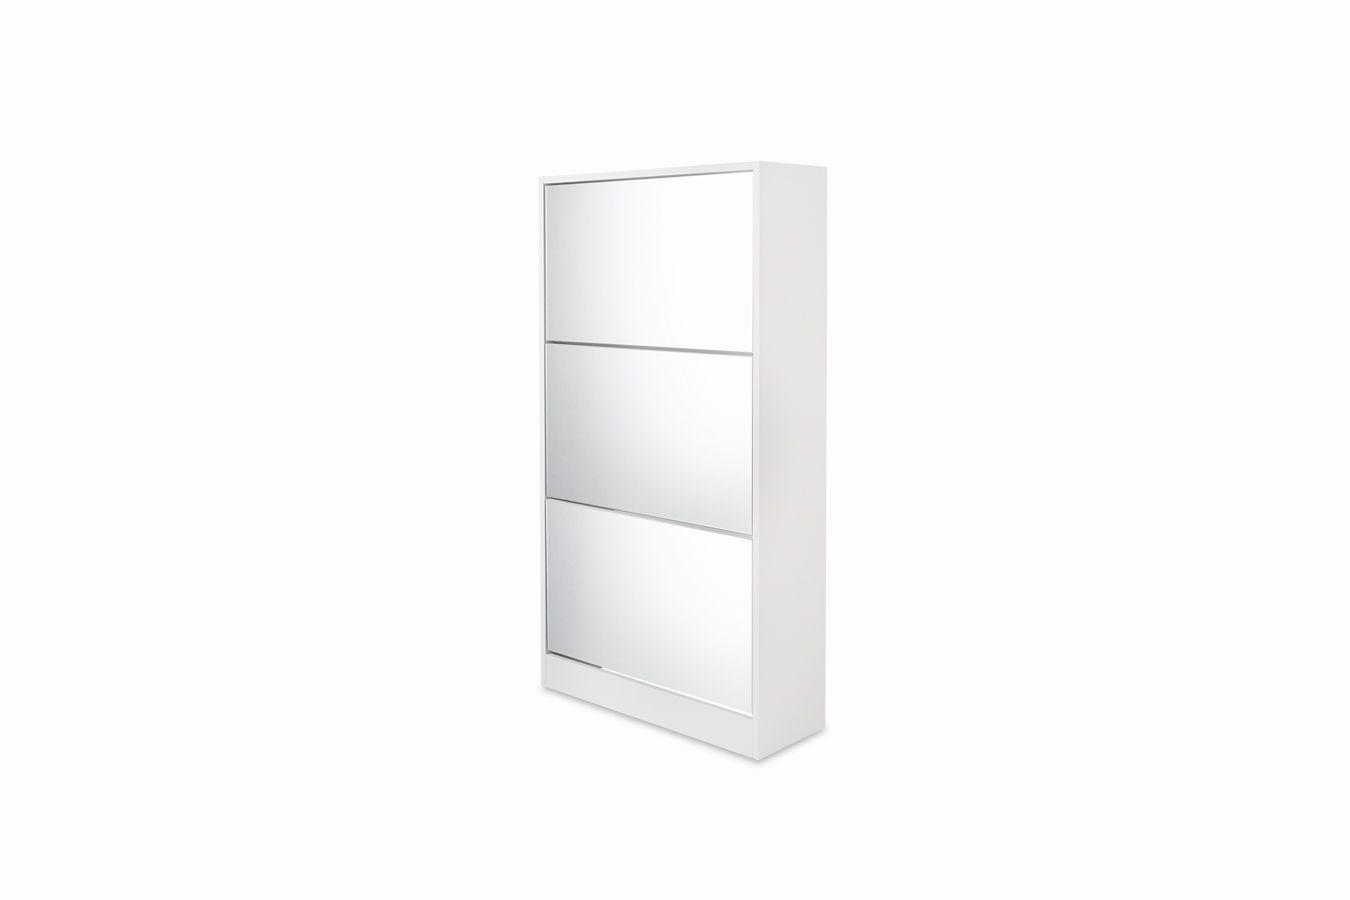 Schoenenkast Met Spiegel : Schoenenkast met spiegel lifa living